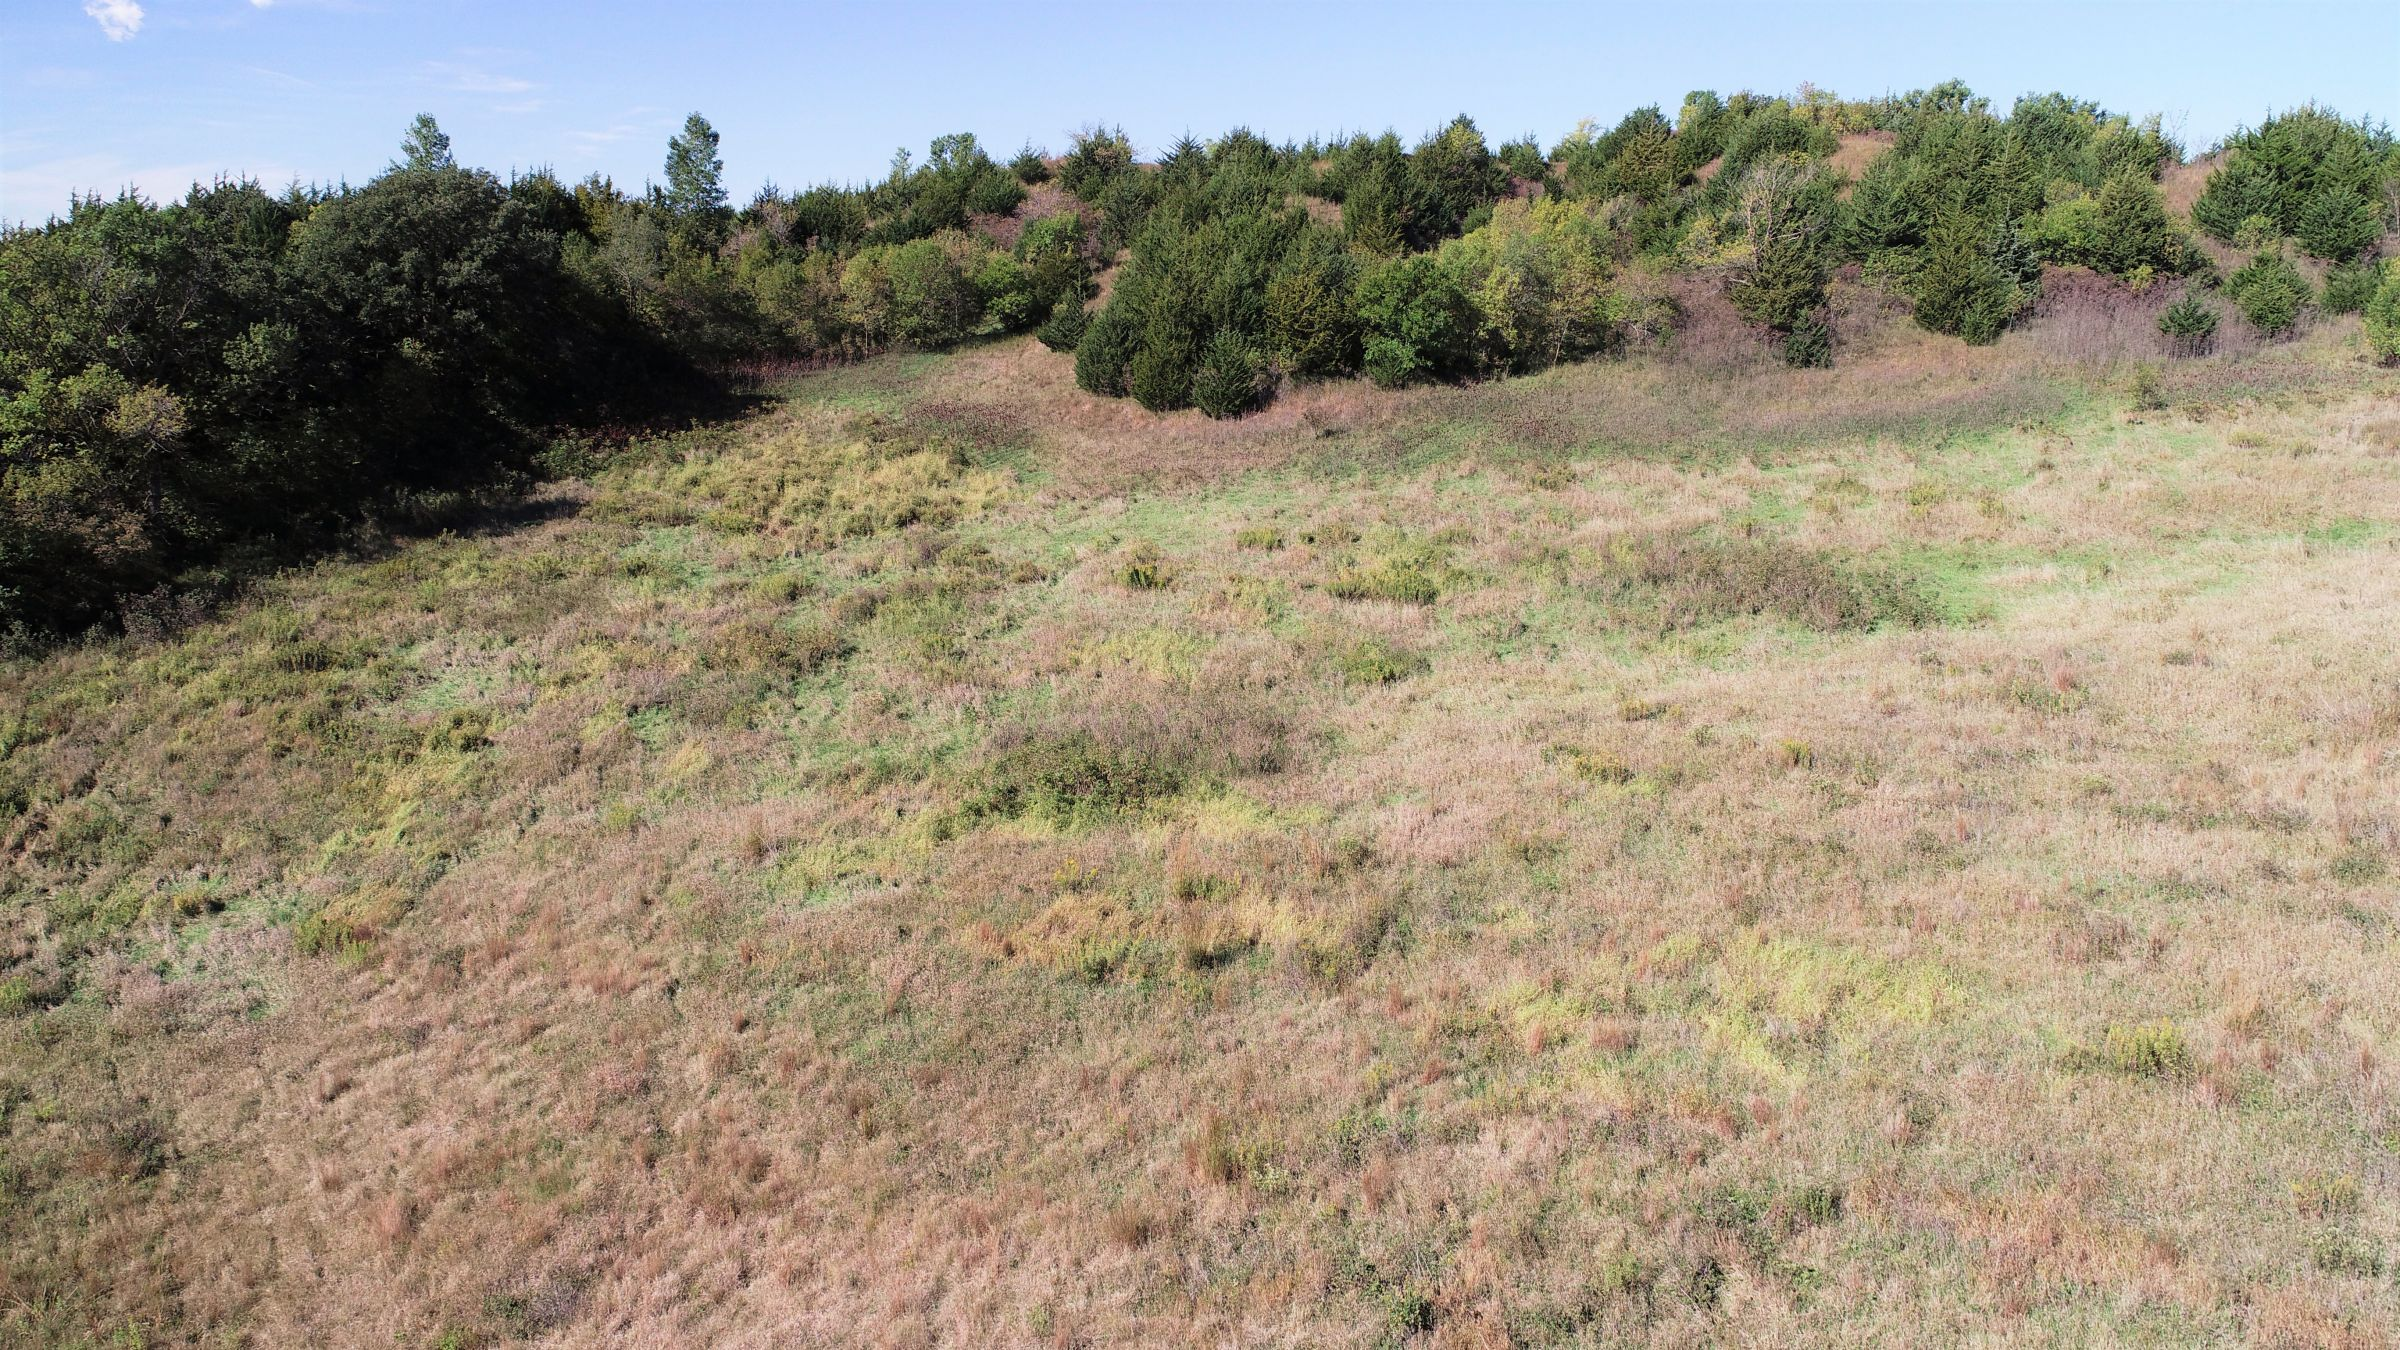 land-harrison-county-iowa-59-acres-listing-number-15527-3-2021-05-21-212628.JPG